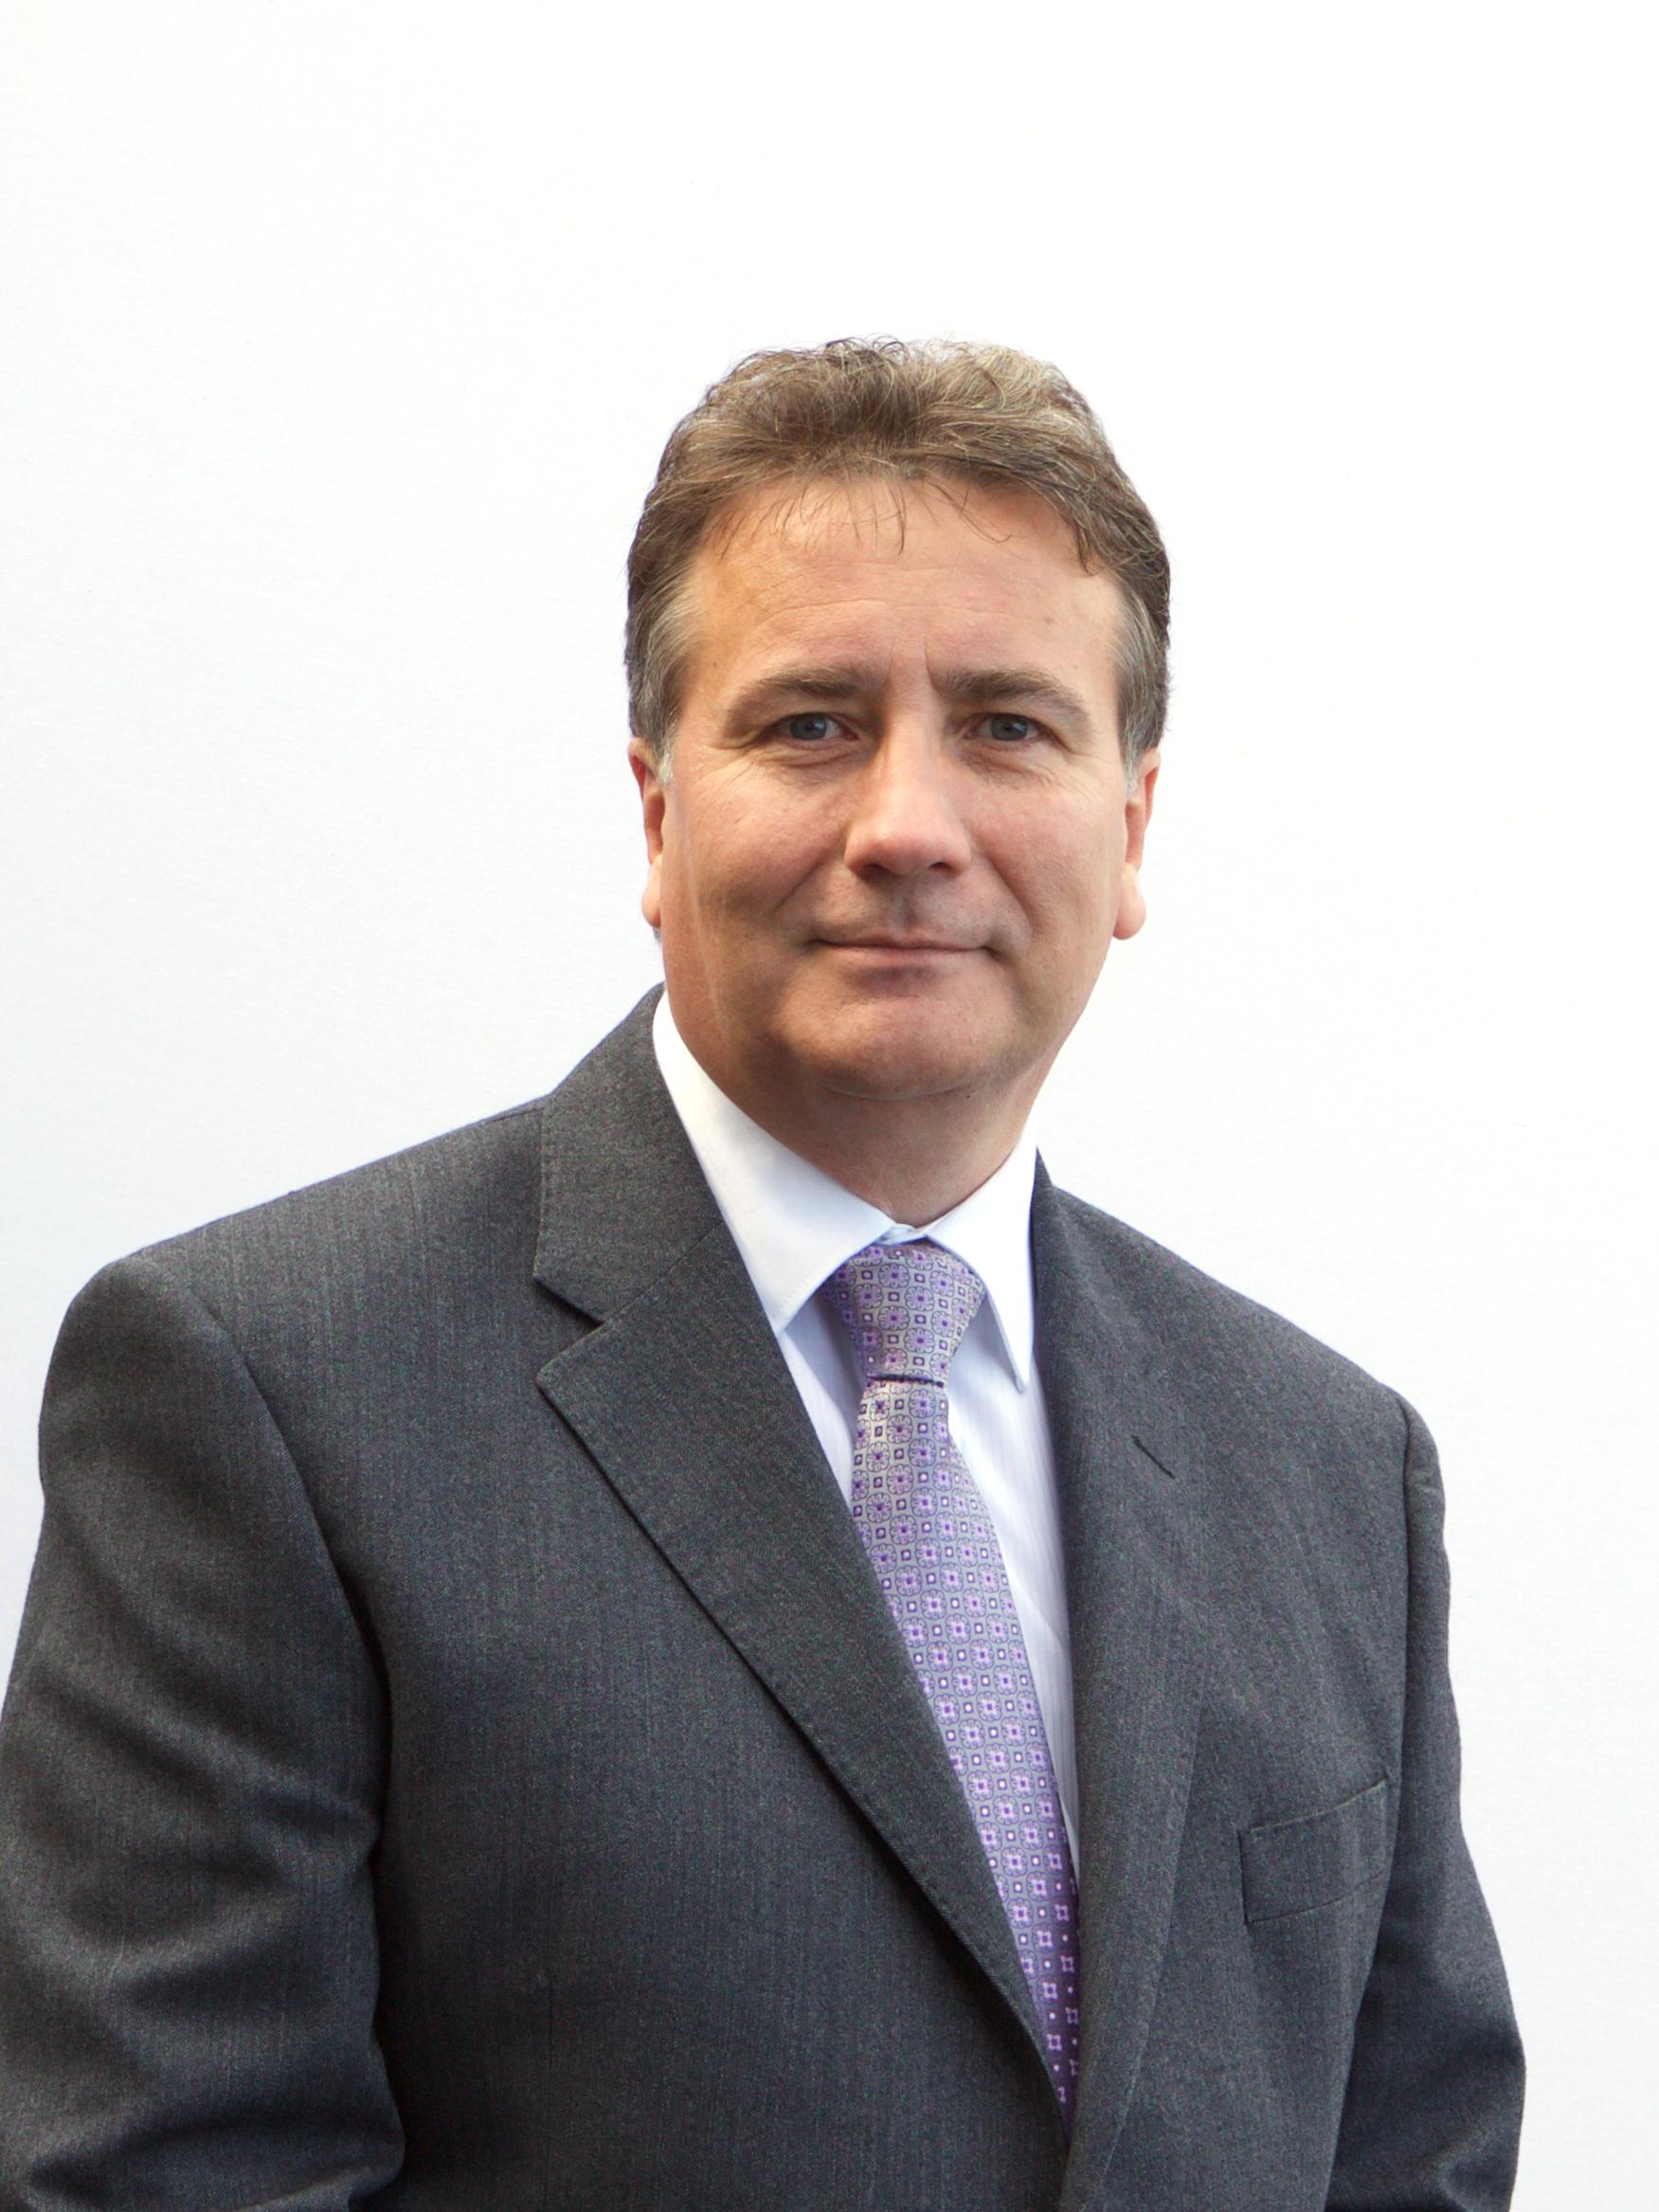 Image of Malcolm Pearson